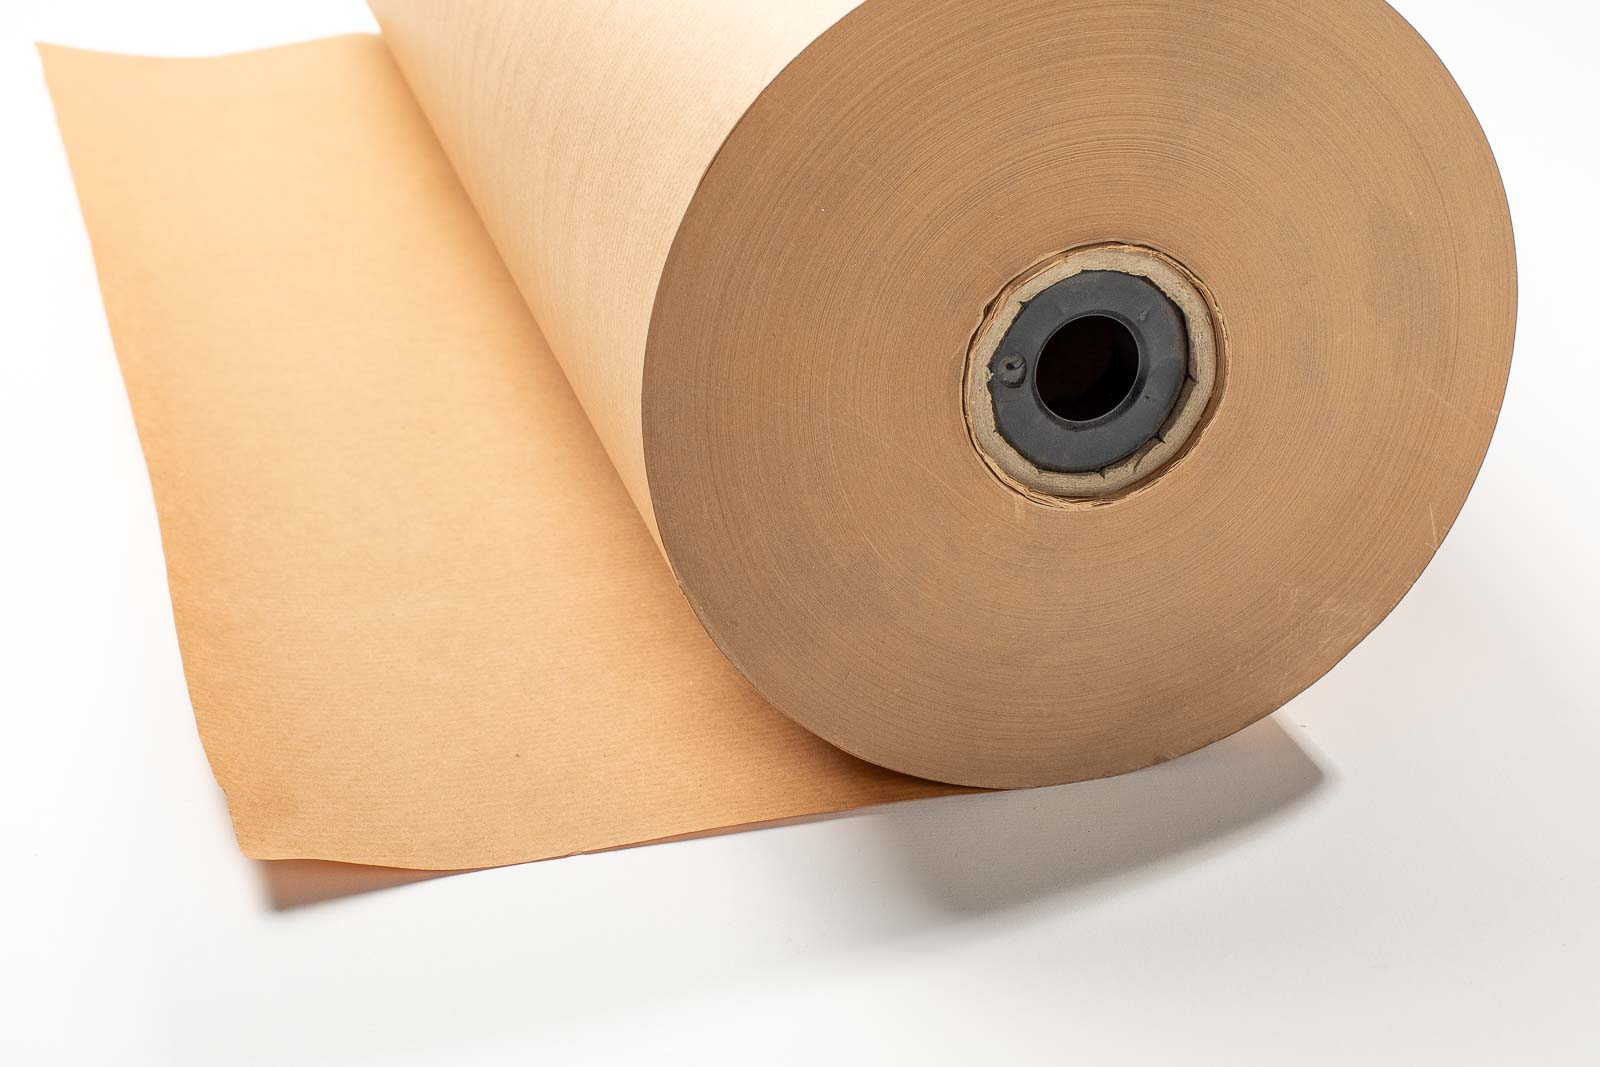 Kraftpapier braun, Secare-Rolle